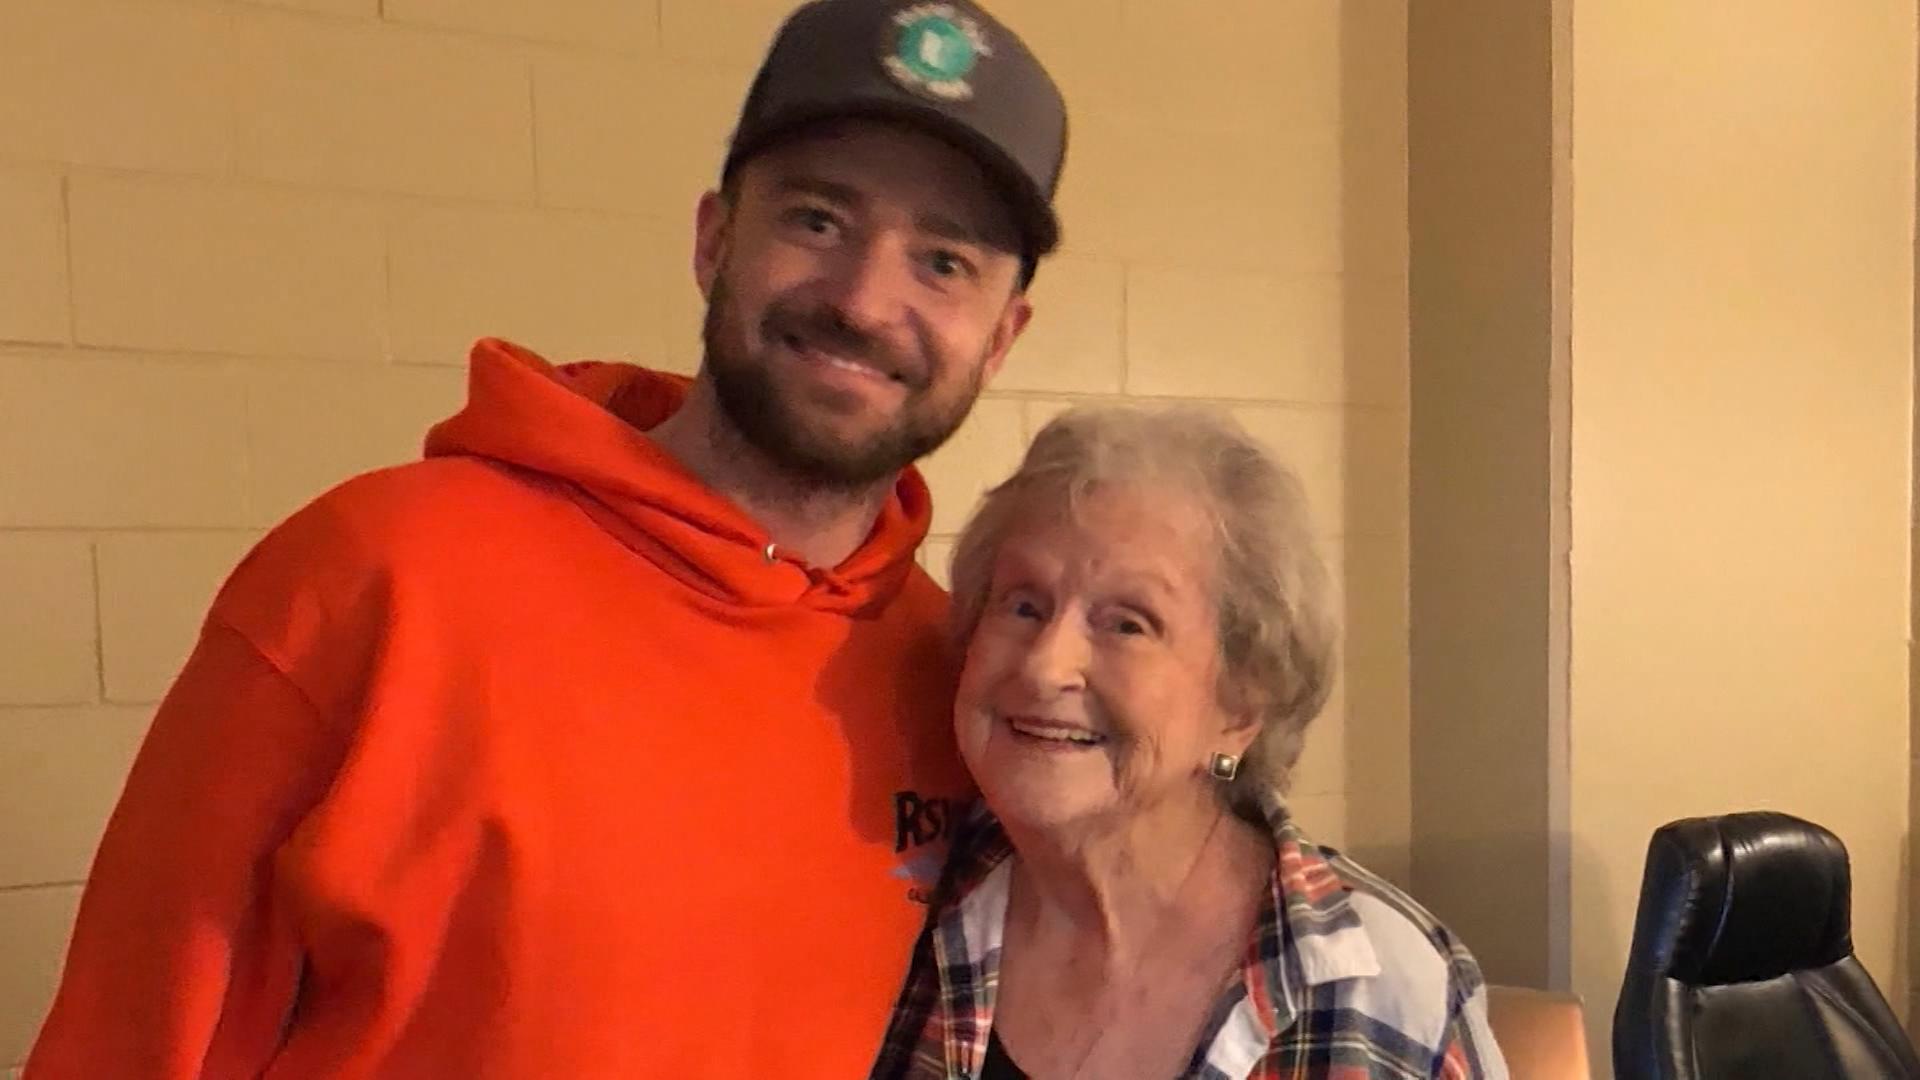 Justin timberlake surprises 88 year old fan cnn video m4hsunfo